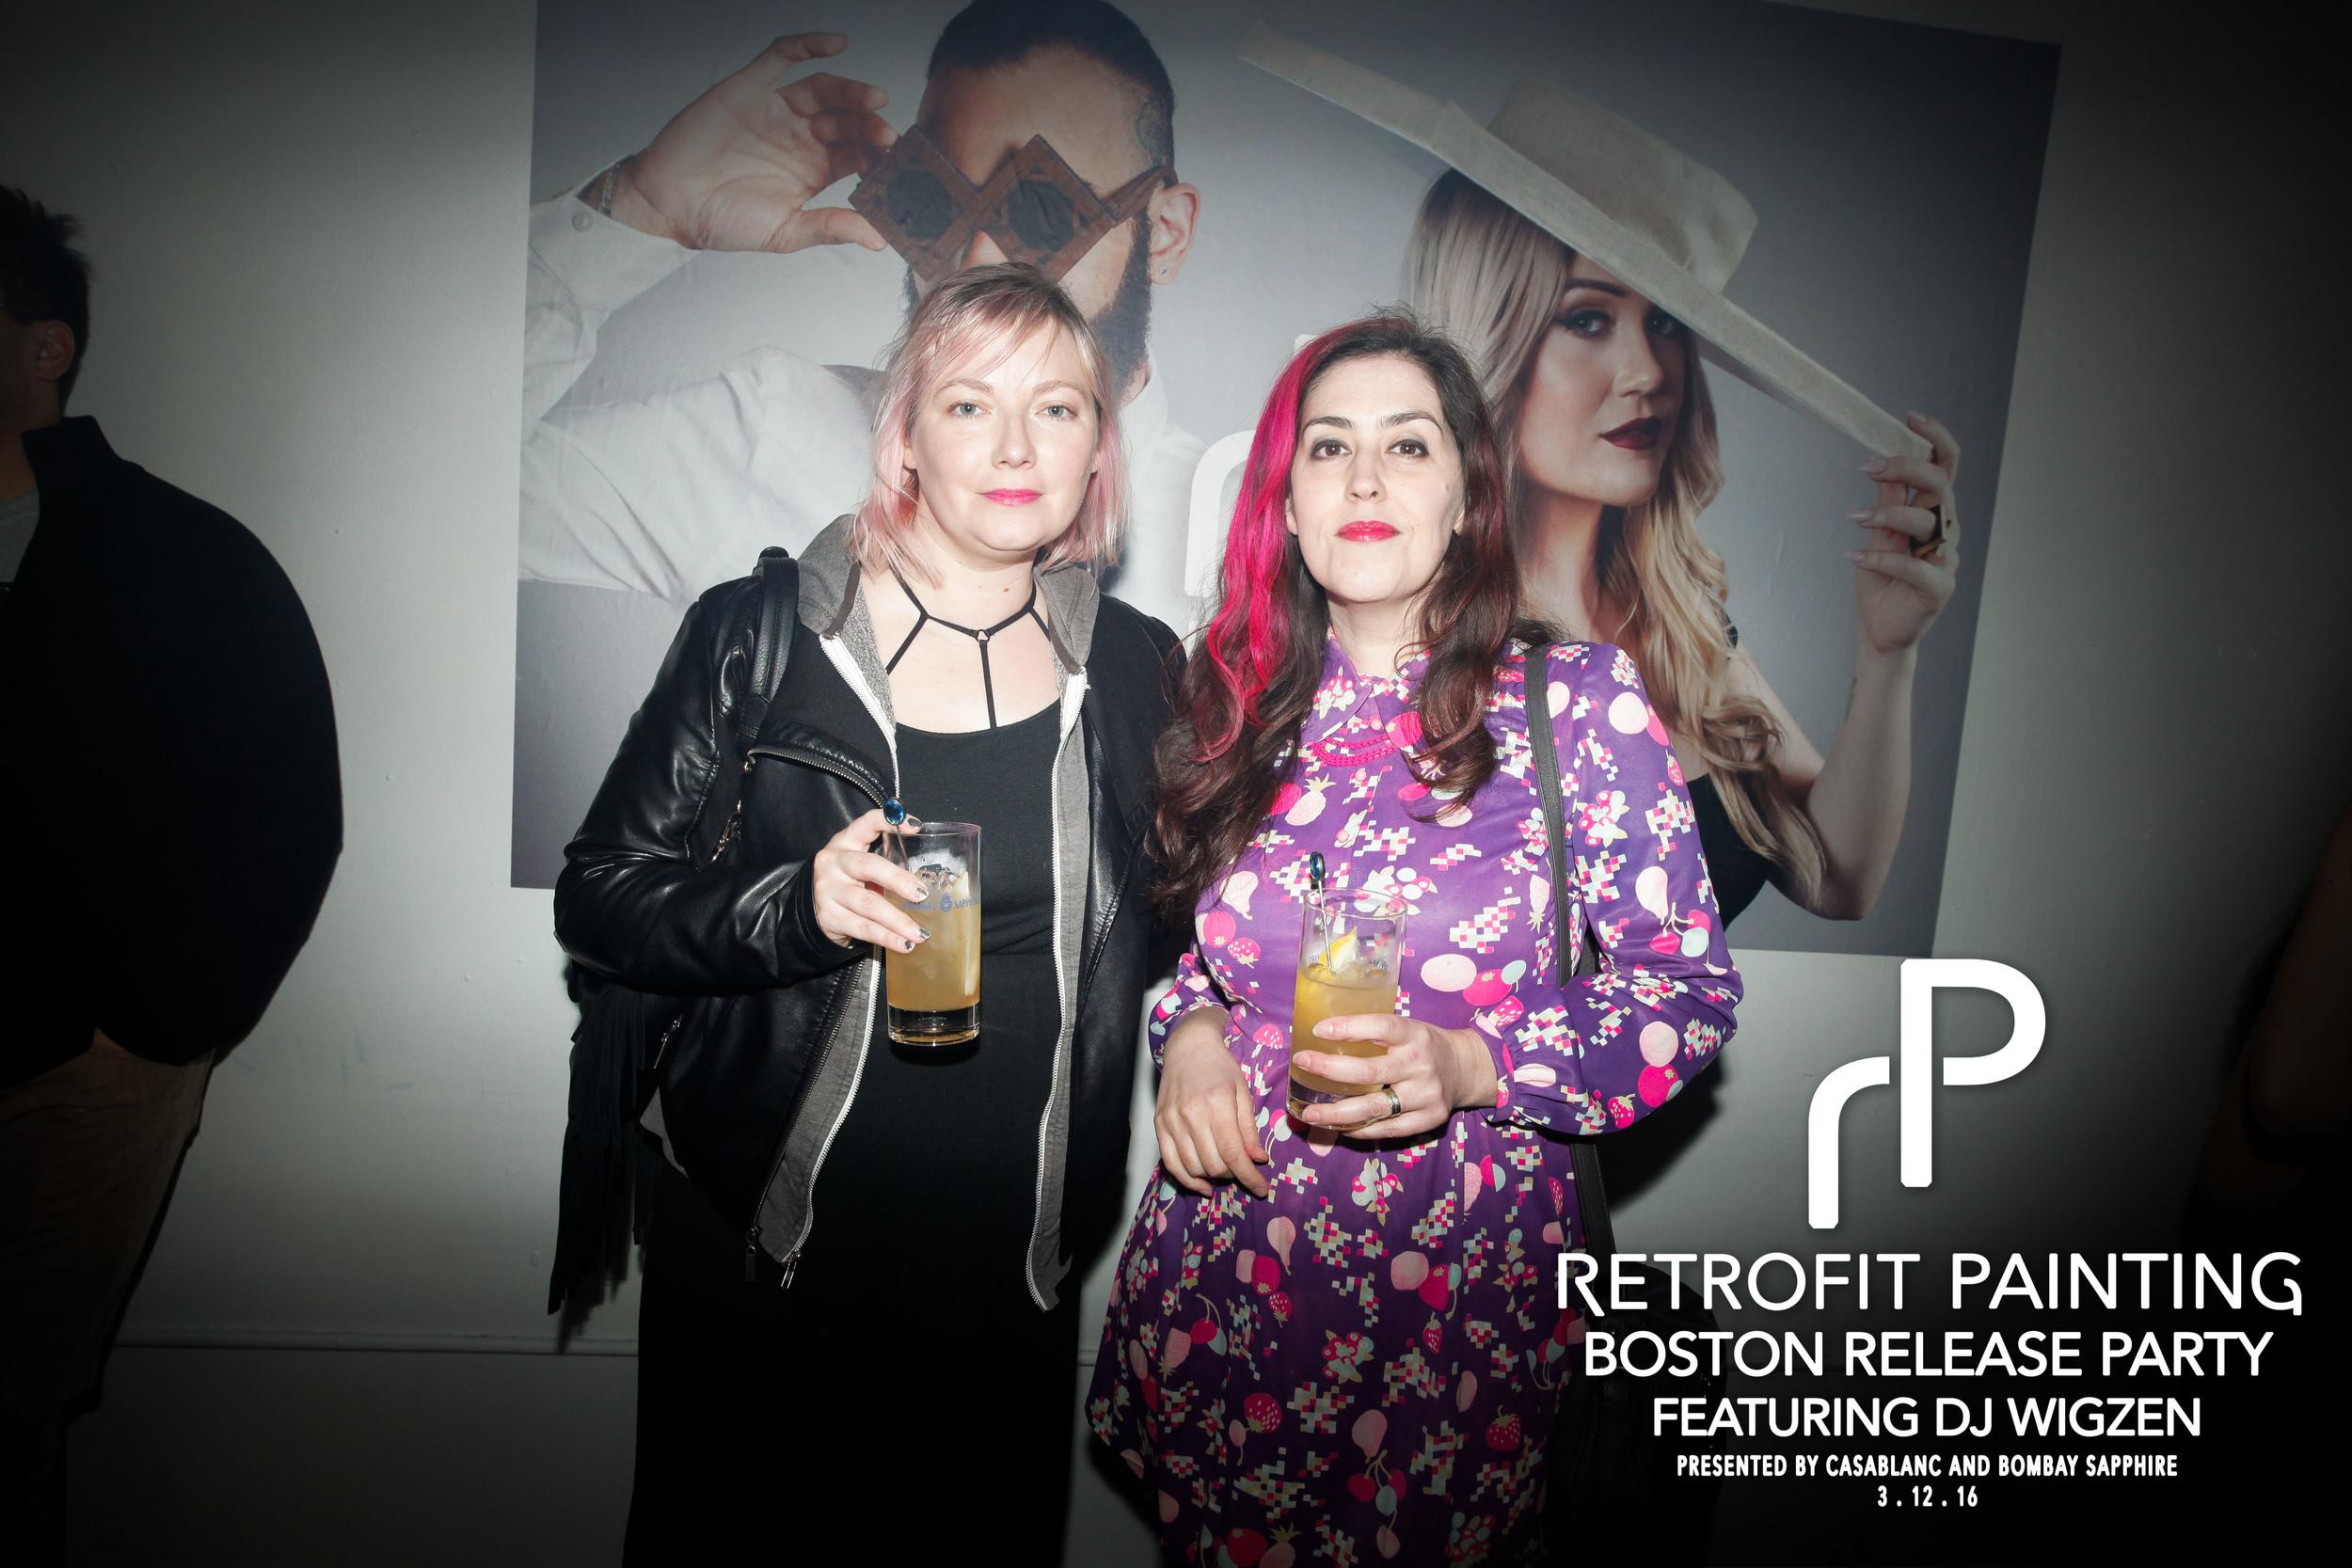 Retrofit Painting Boston Release Party 0126.jpg